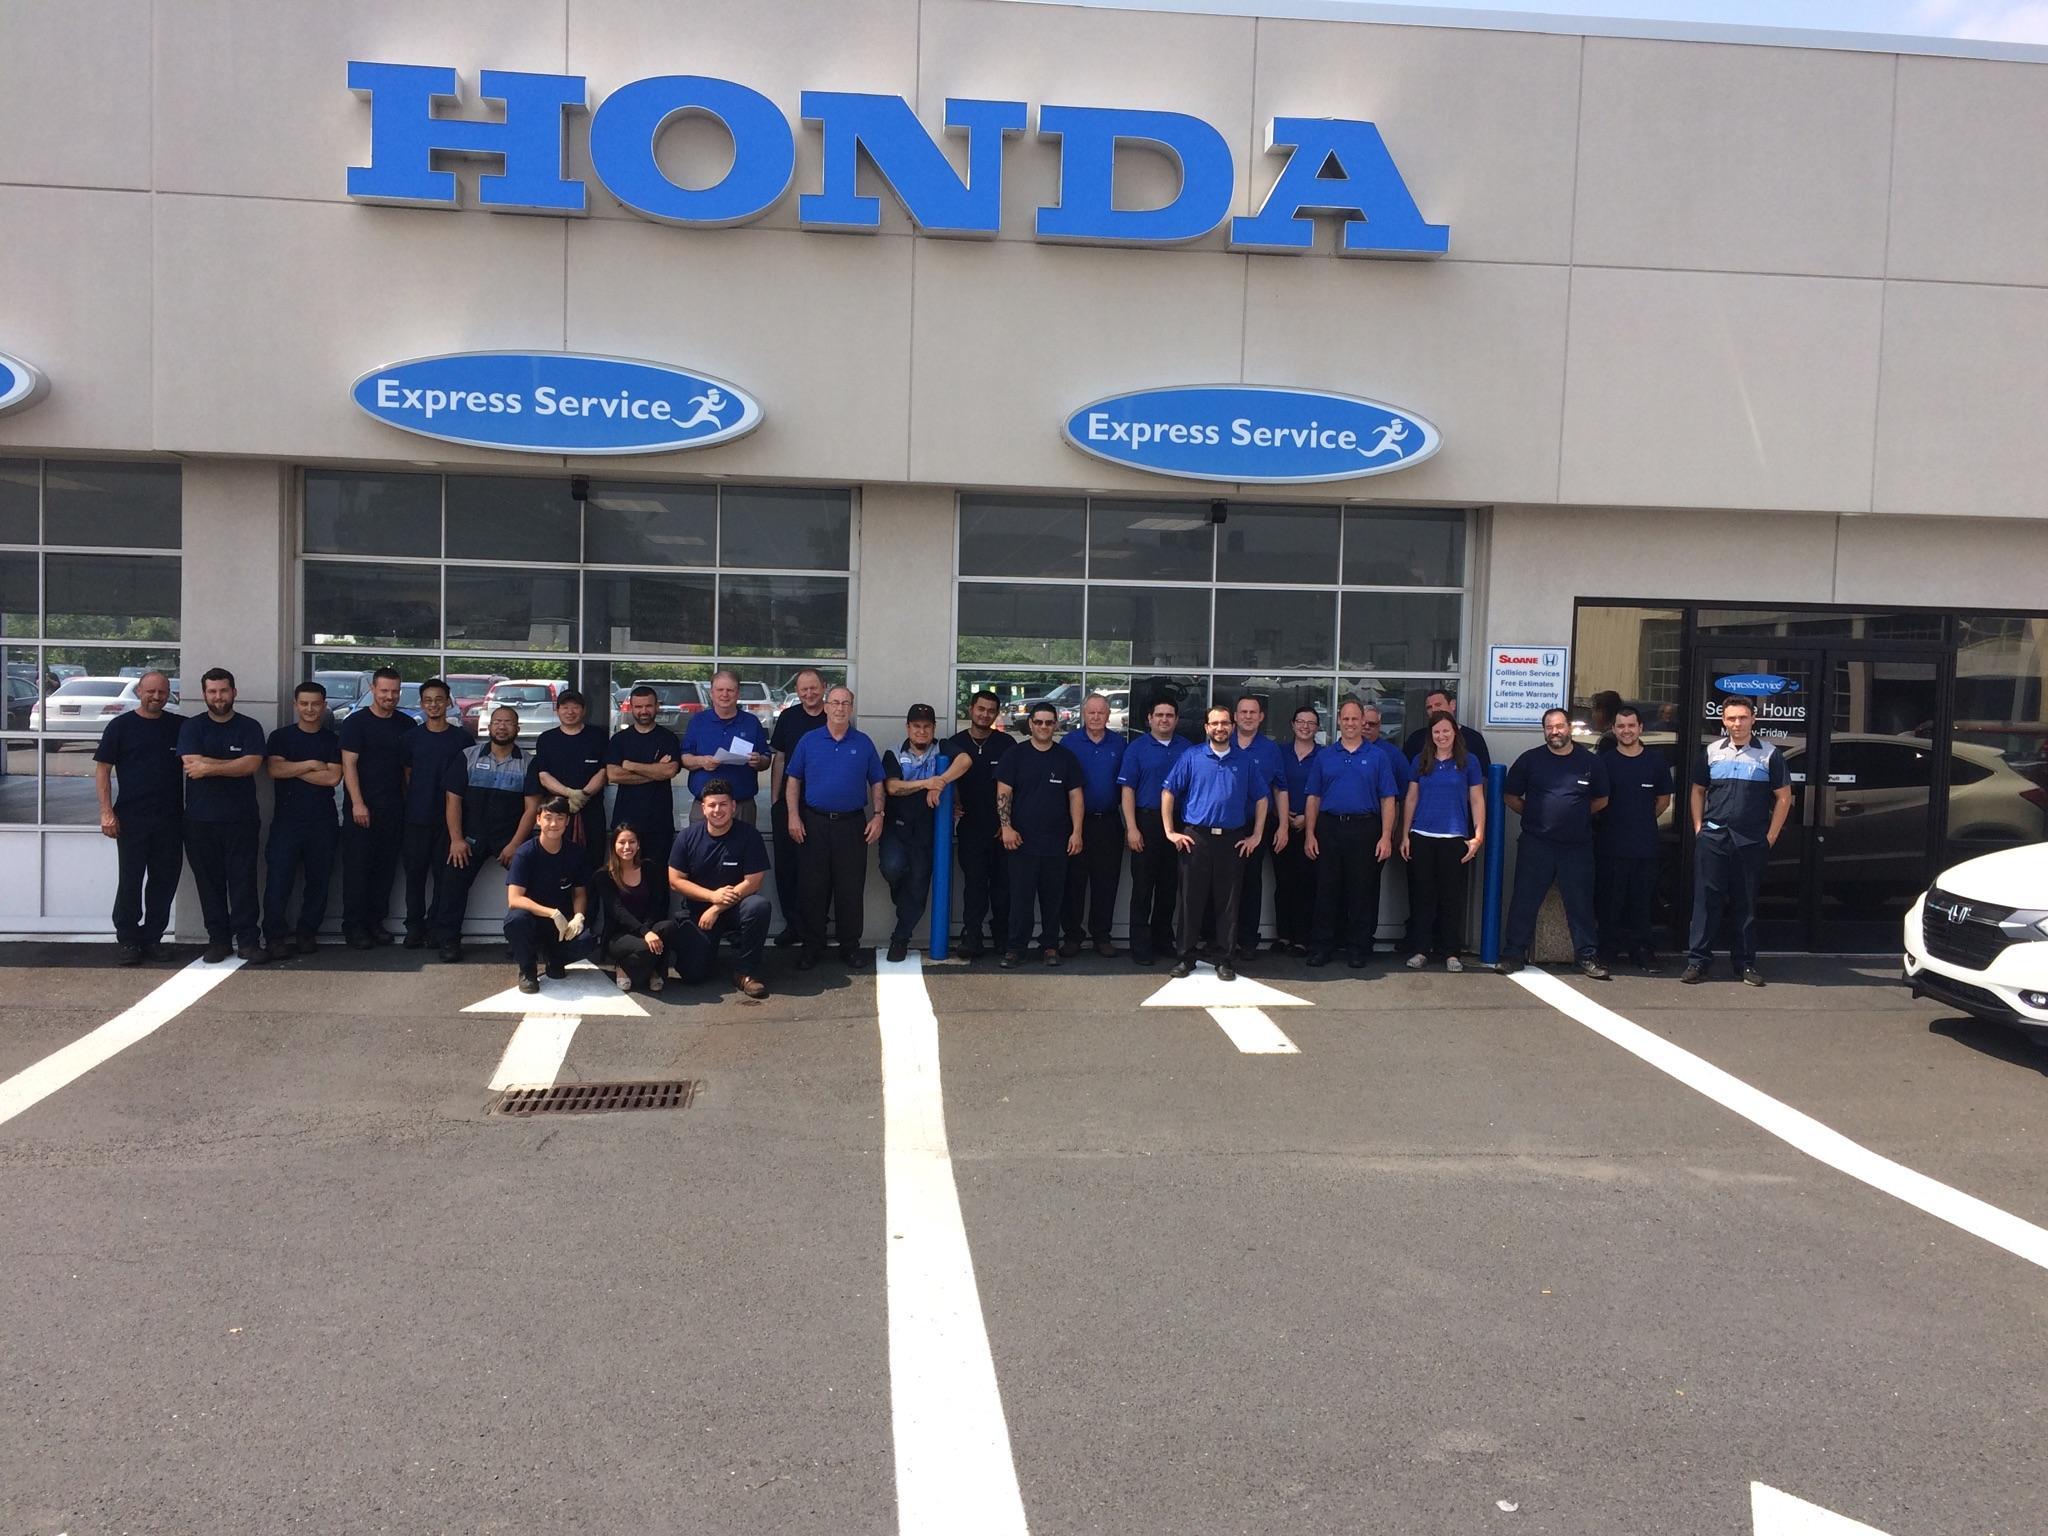 Sloane Honda Philadelphia Staff